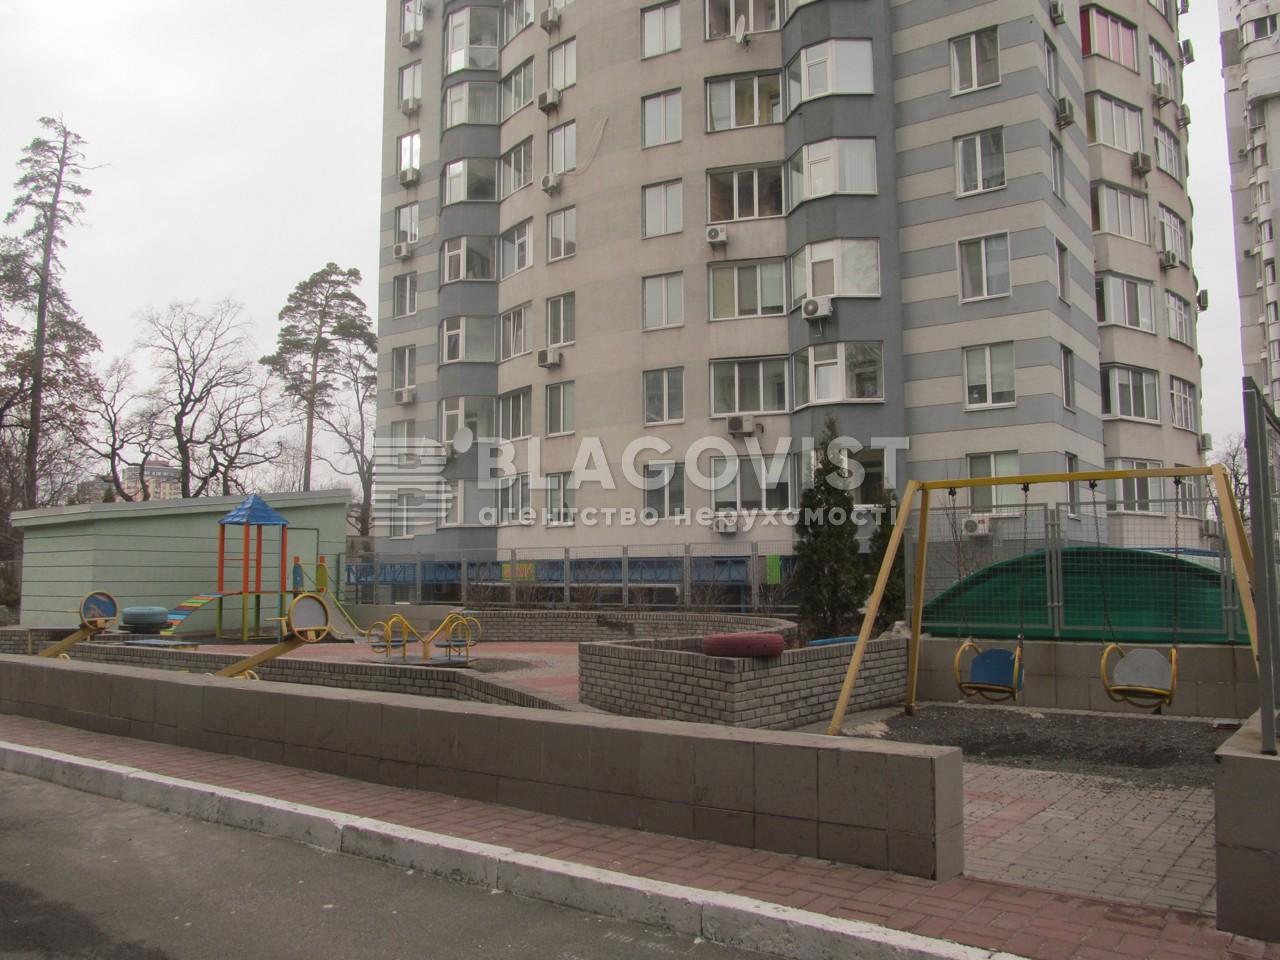 Квартира C-90891, Львовская, 22а, Киев - Фото 4